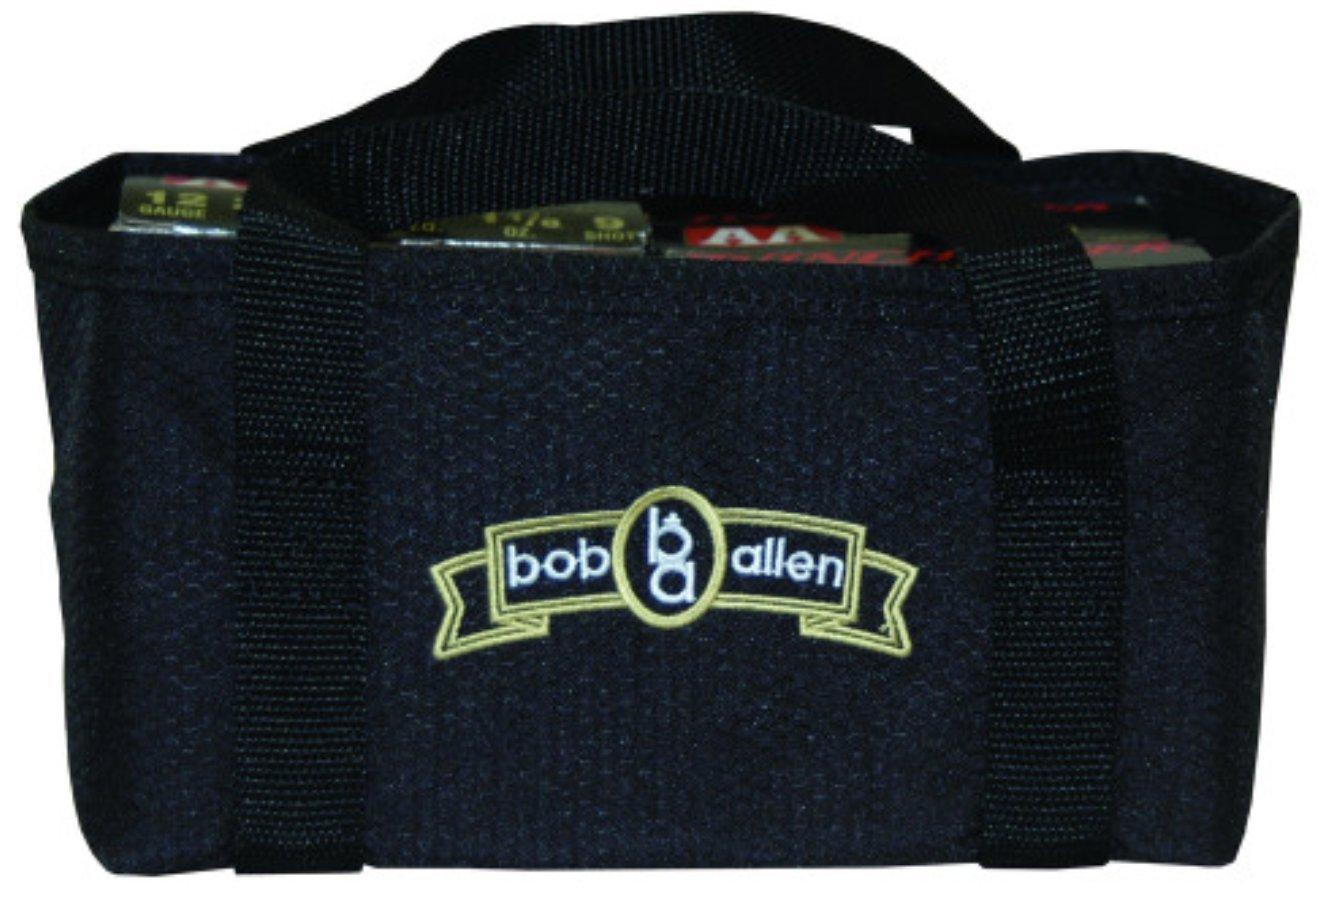 Bob-Allen 22100 4 Box Carrier, Black